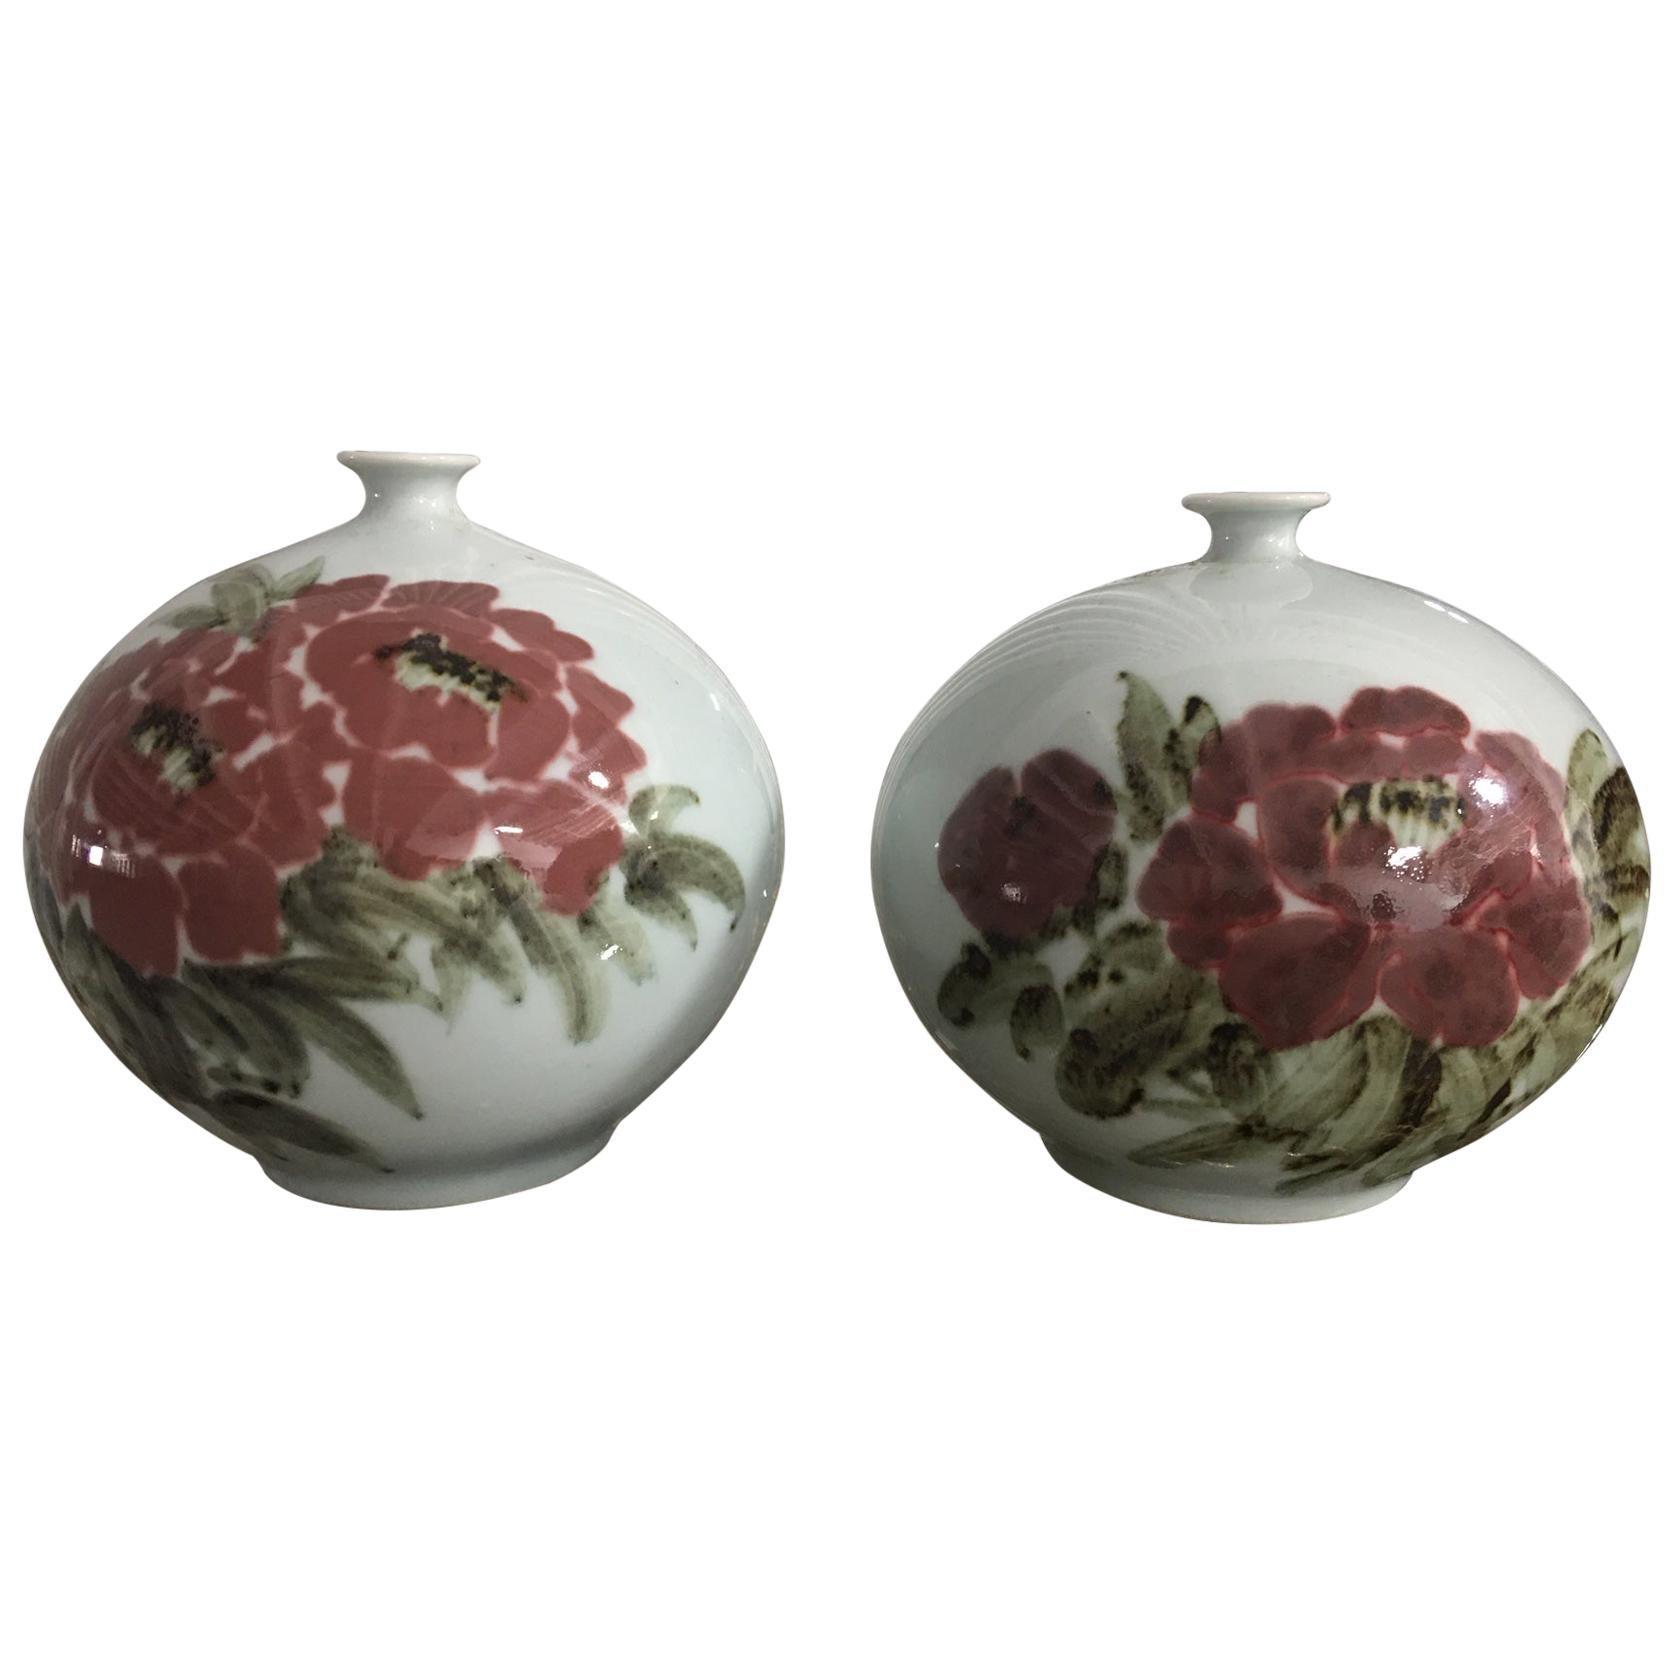 Pair of Asian Motif Bud Vases, 20th Century